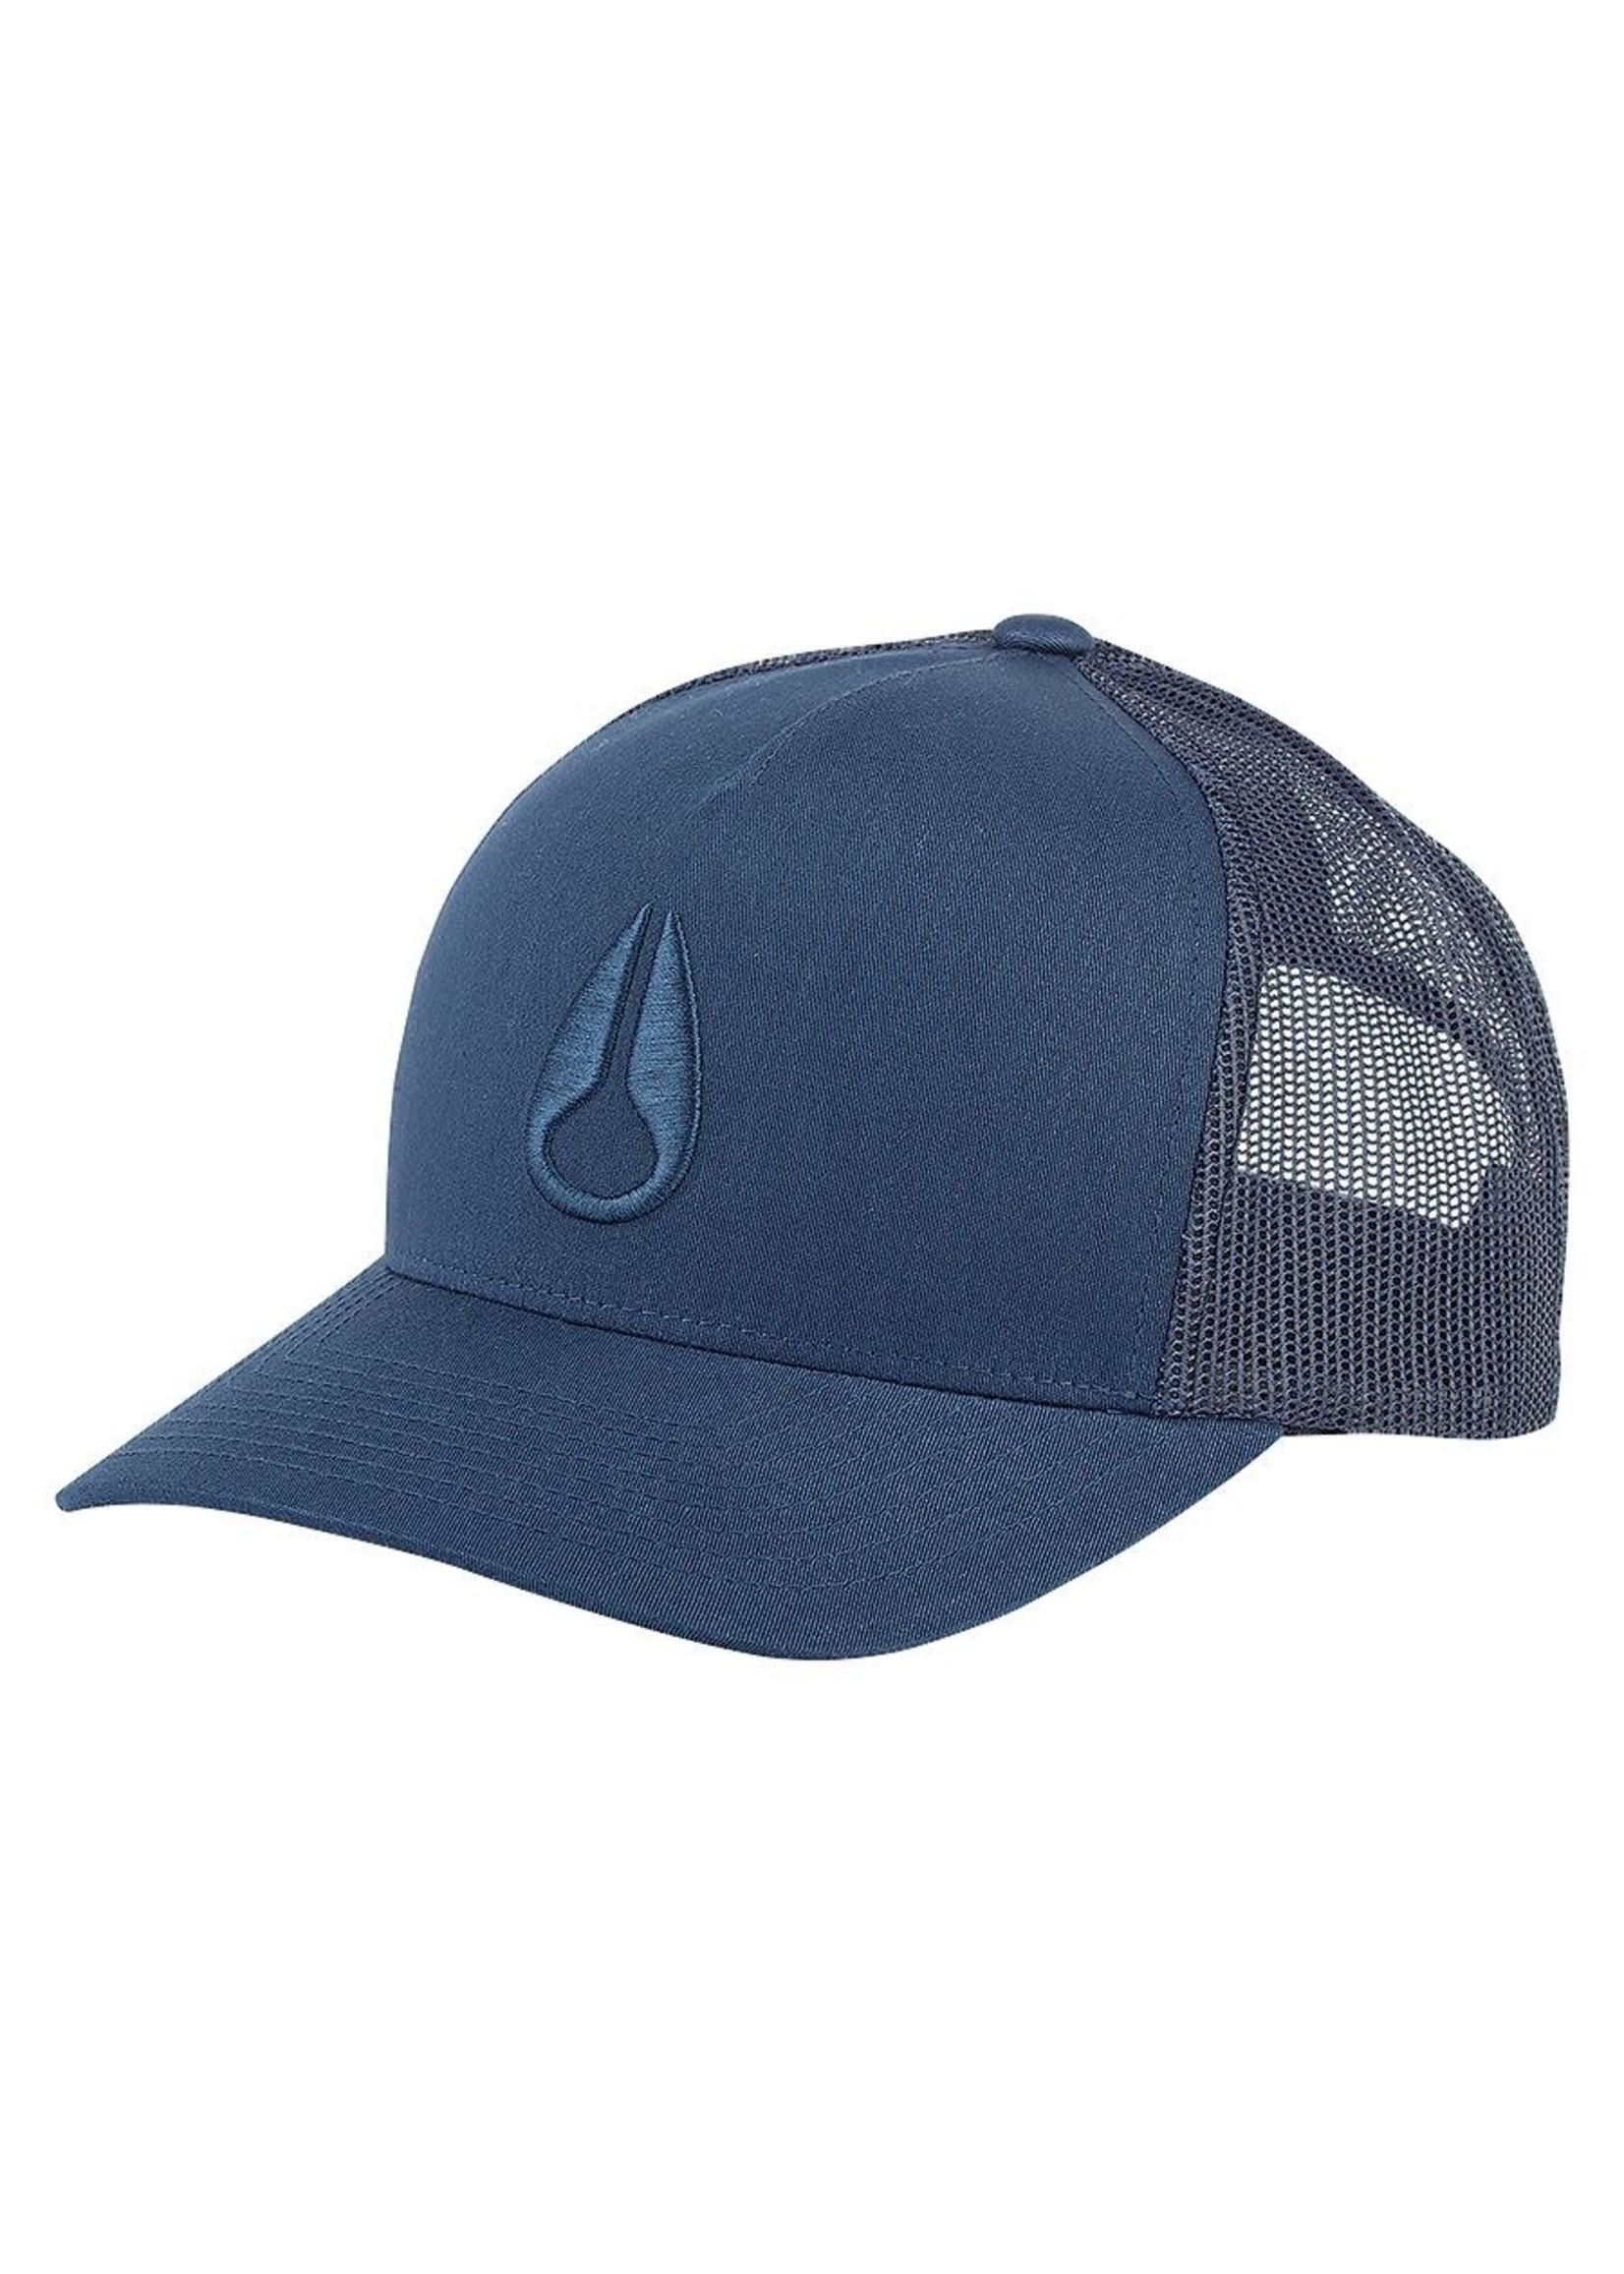 NIXON ICONED TRUCKER HAT, Navy